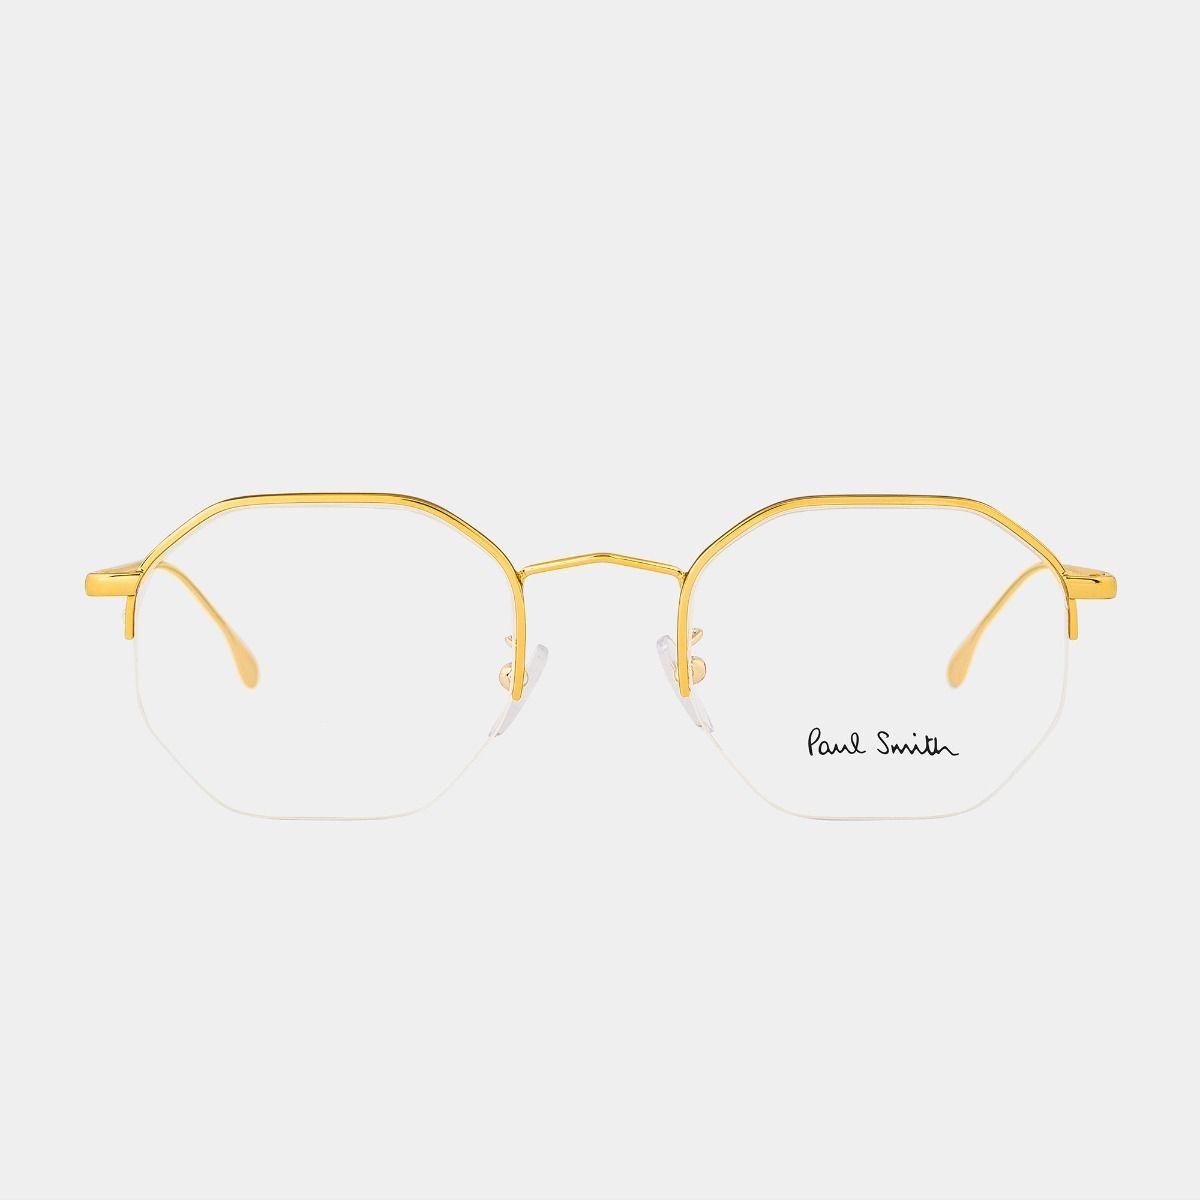 Paul Smith Brompton Optical Hexagonal Round Glasses